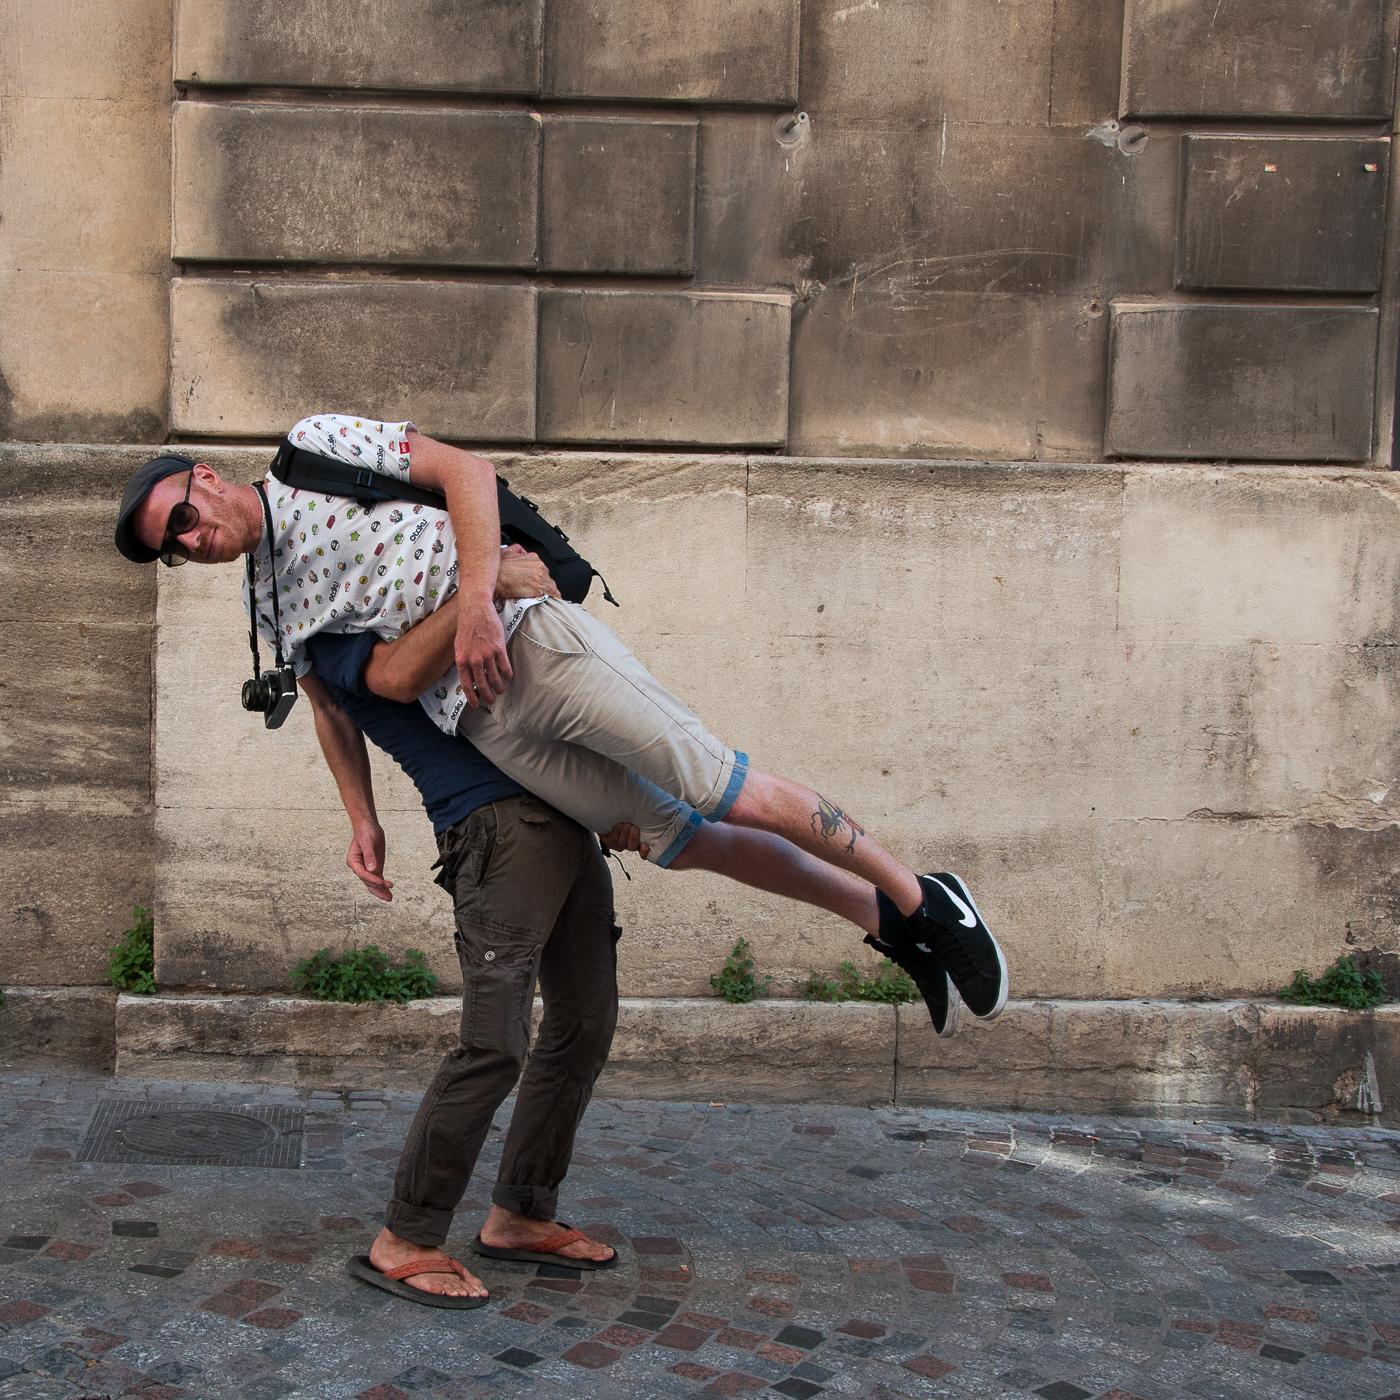 Arles_2015_-_Photographe_penché